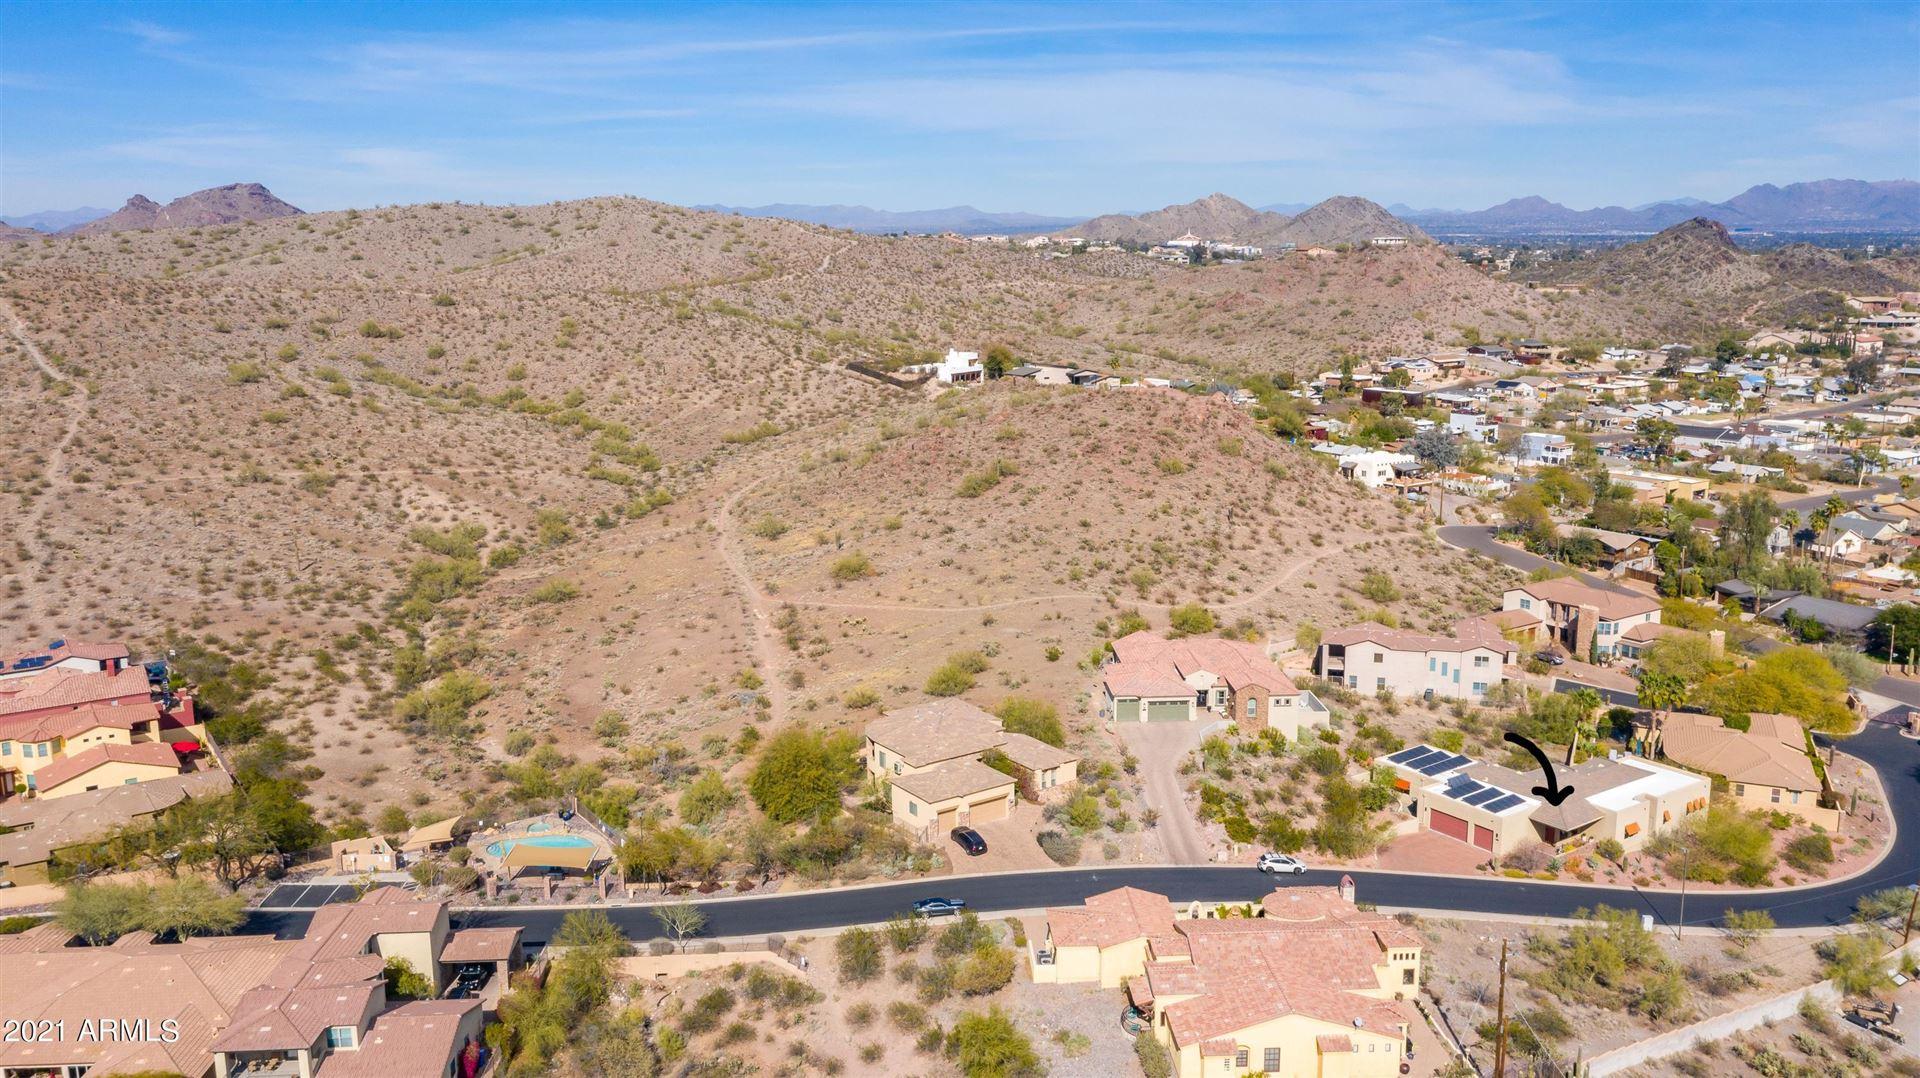 1330 E LUPINE Avenue, Phoenix, AZ 85020 - MLS#: 6199322